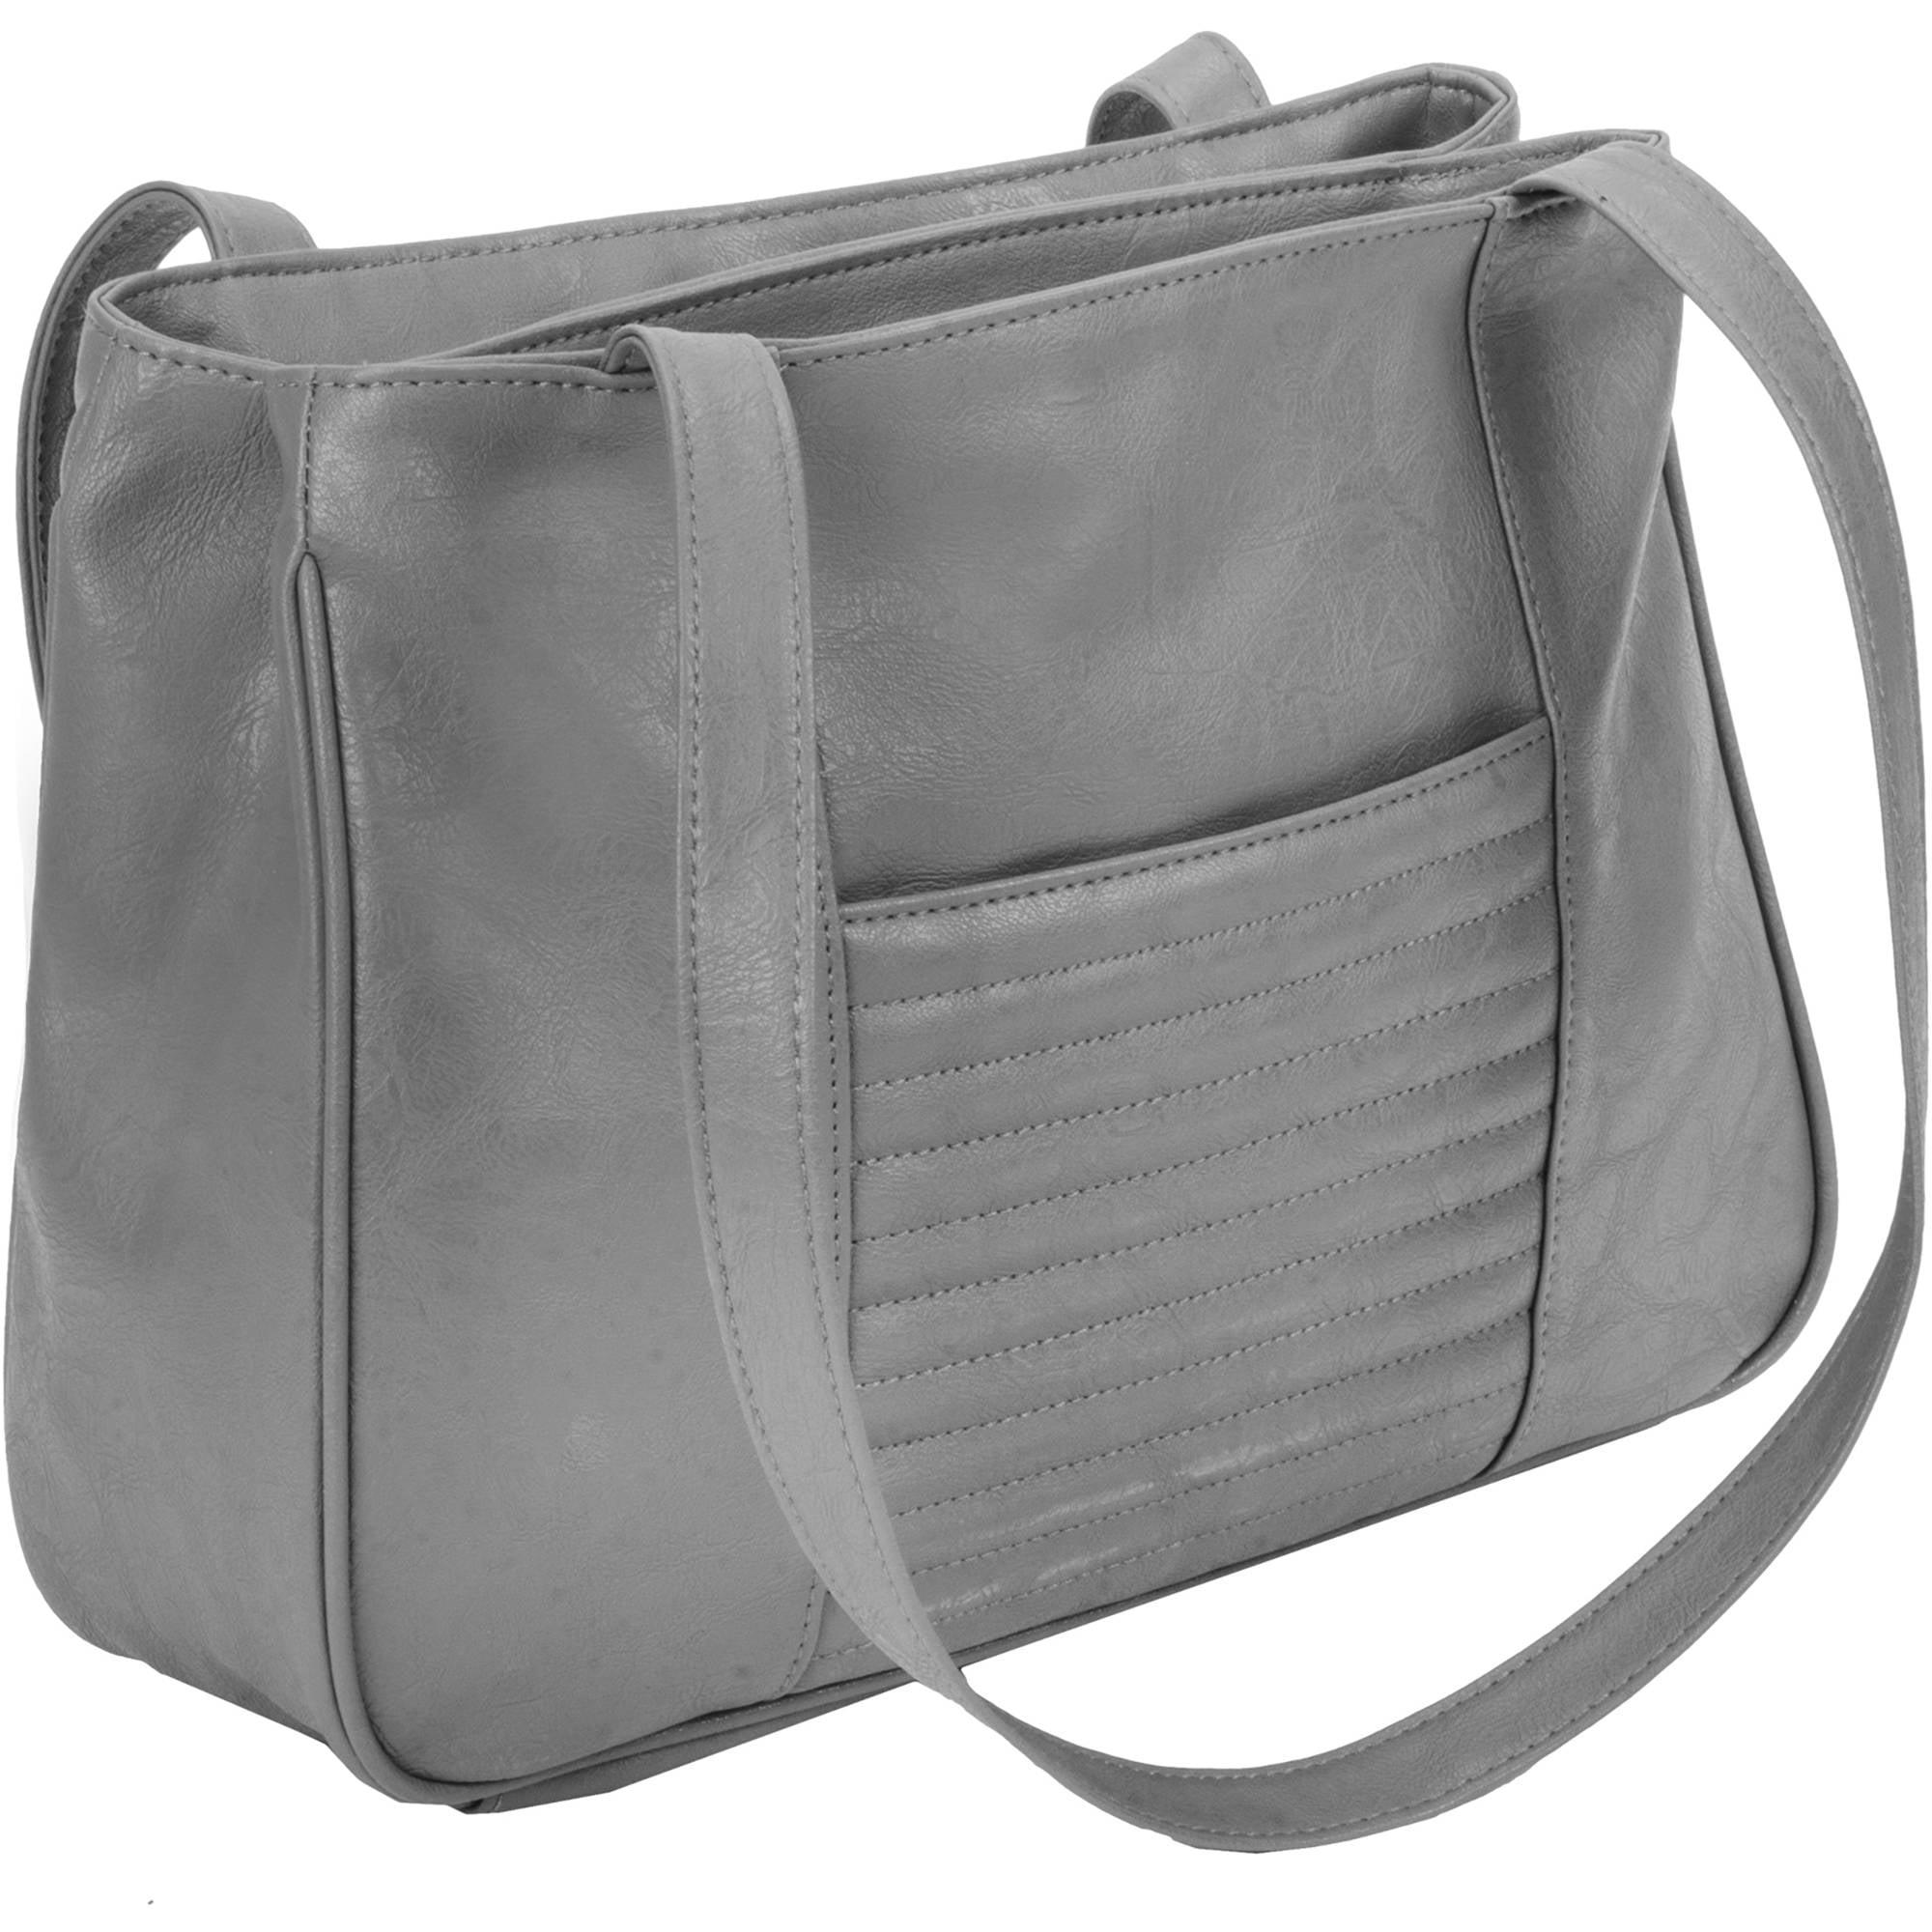 Handbag Organizers - Walmart.com